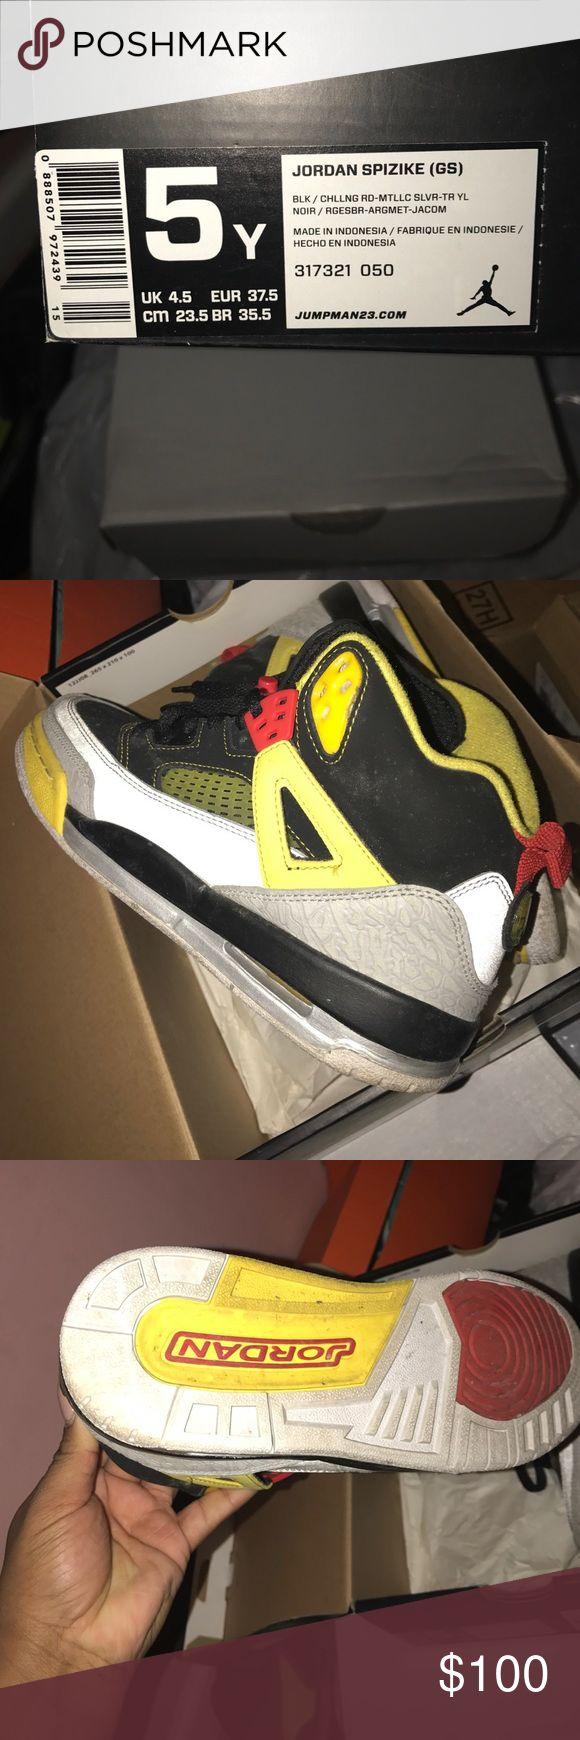 Jordan SPIZIKE ( grade school ) Jordan spizike ( GS ) Jordan Shoes Sneakers